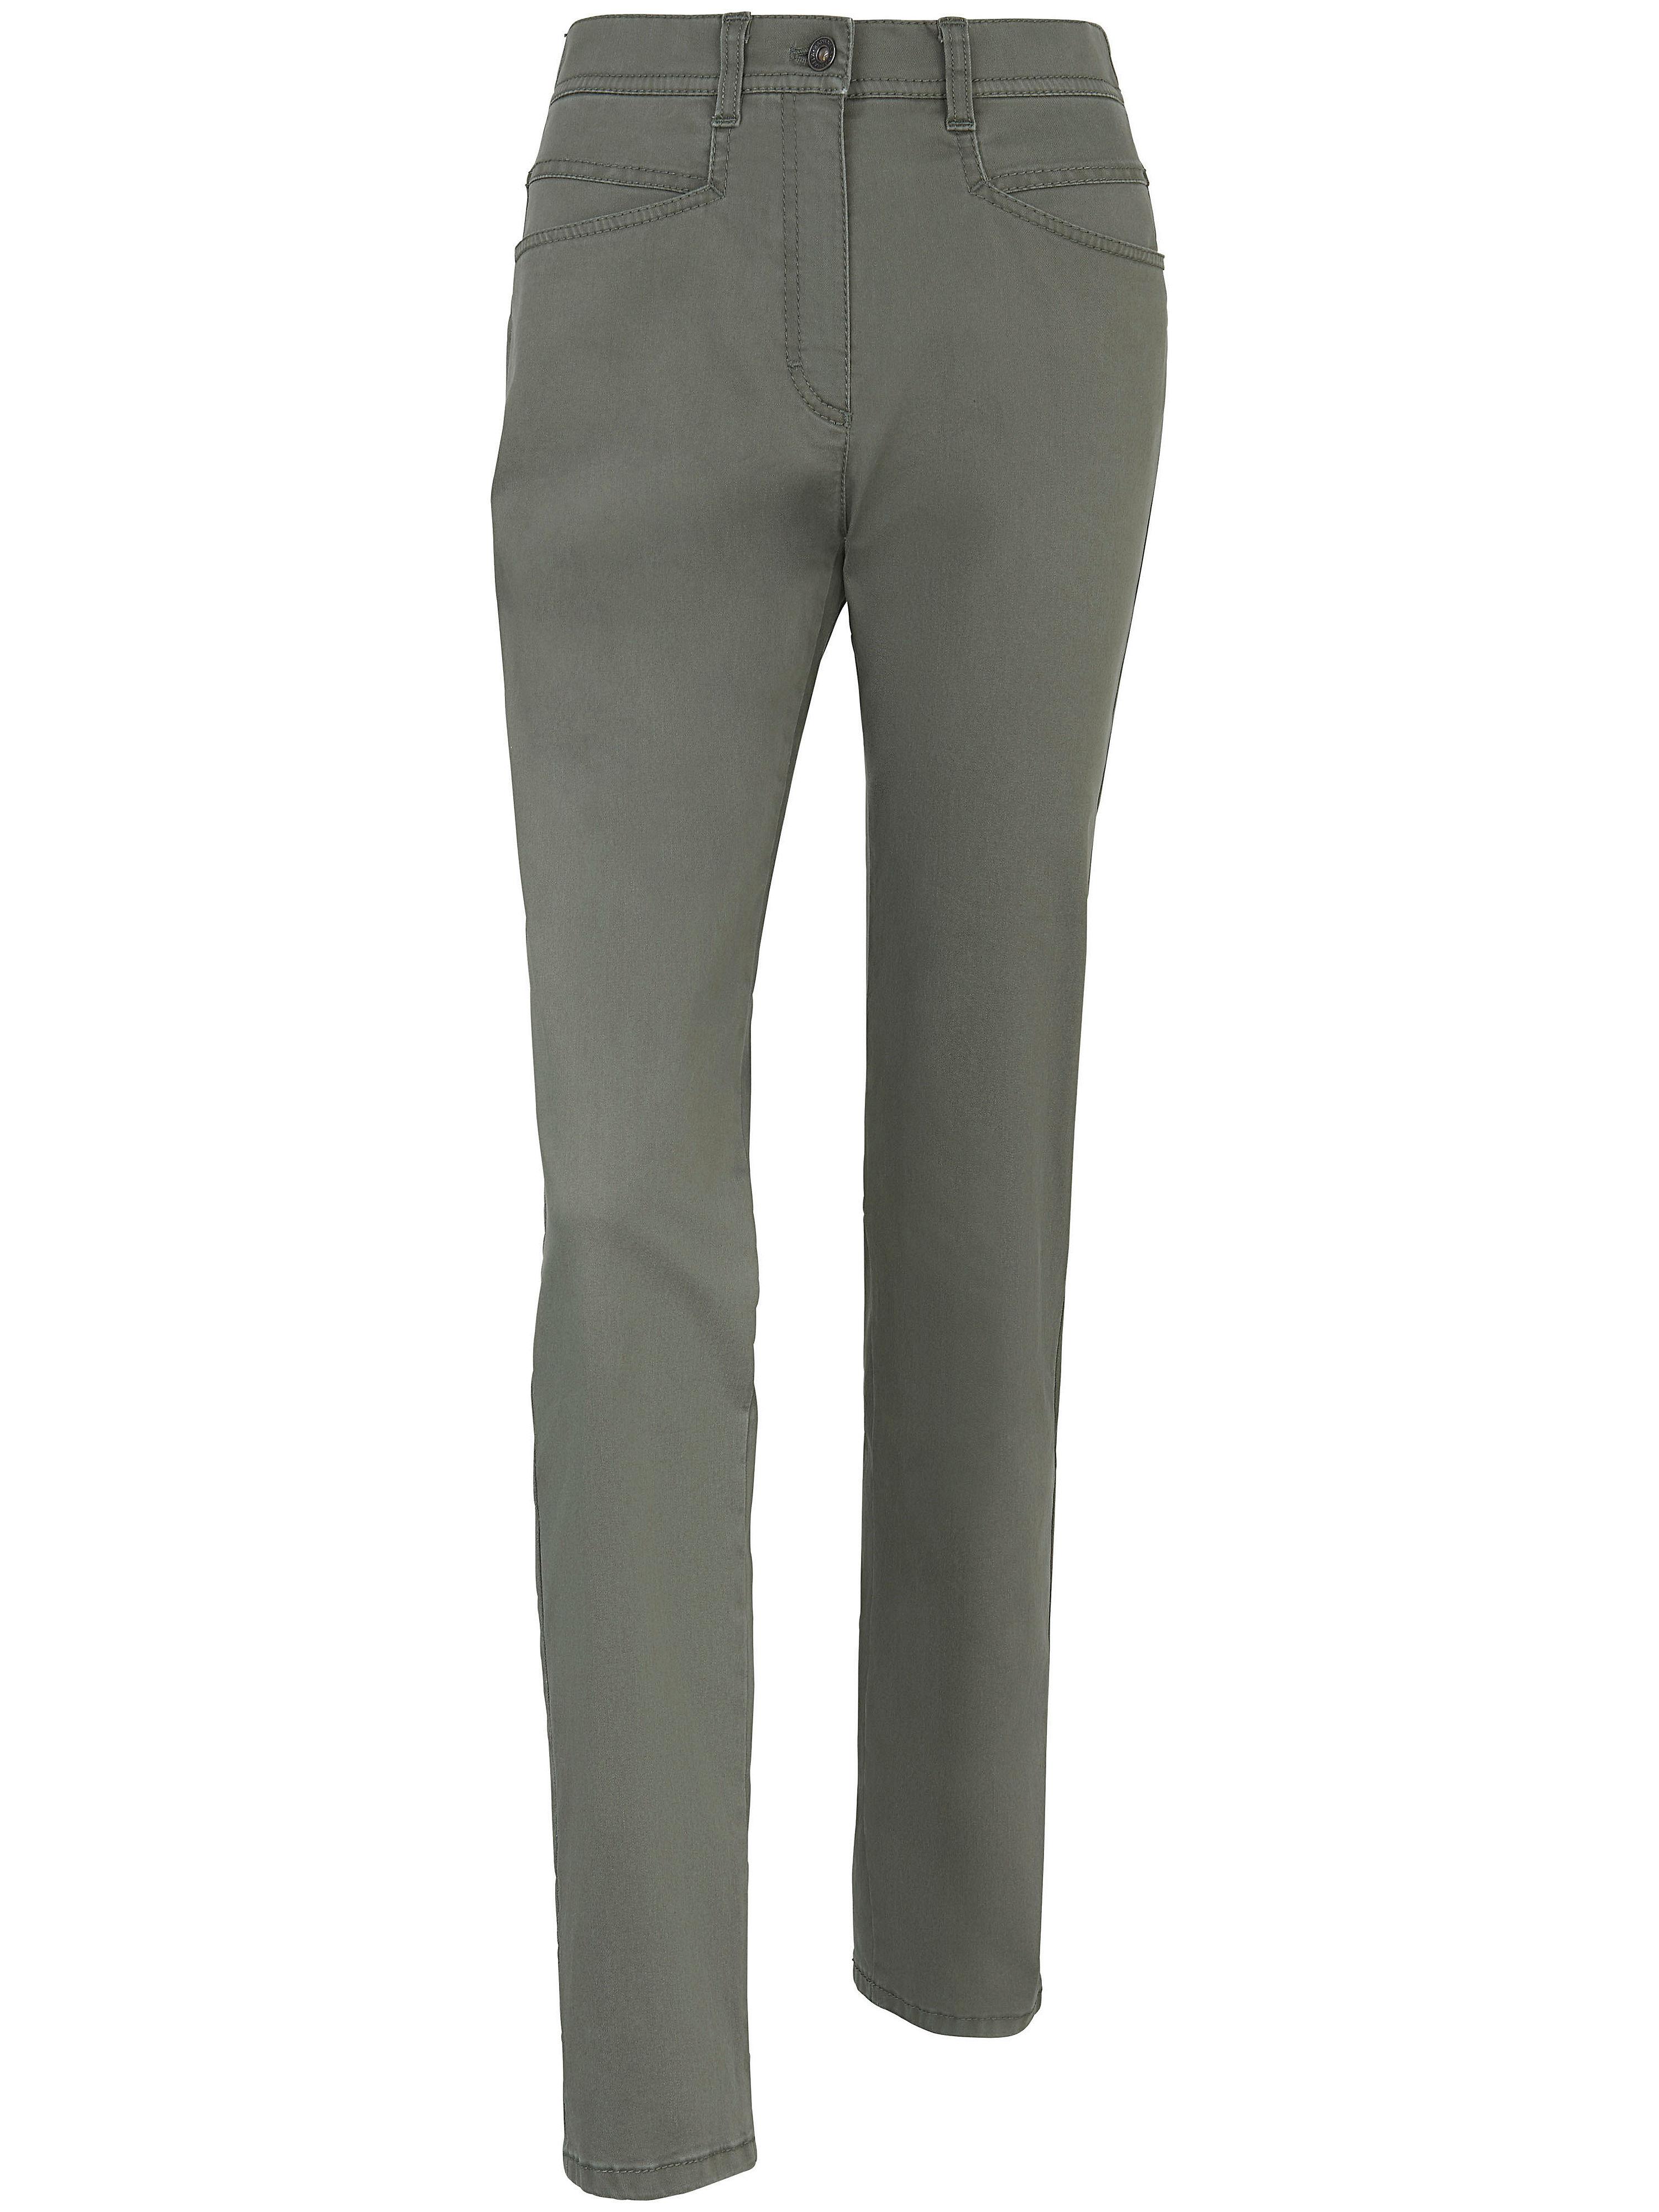 'Comfort Plus-jeans, model Cordula Van Raphaela by Brax denim